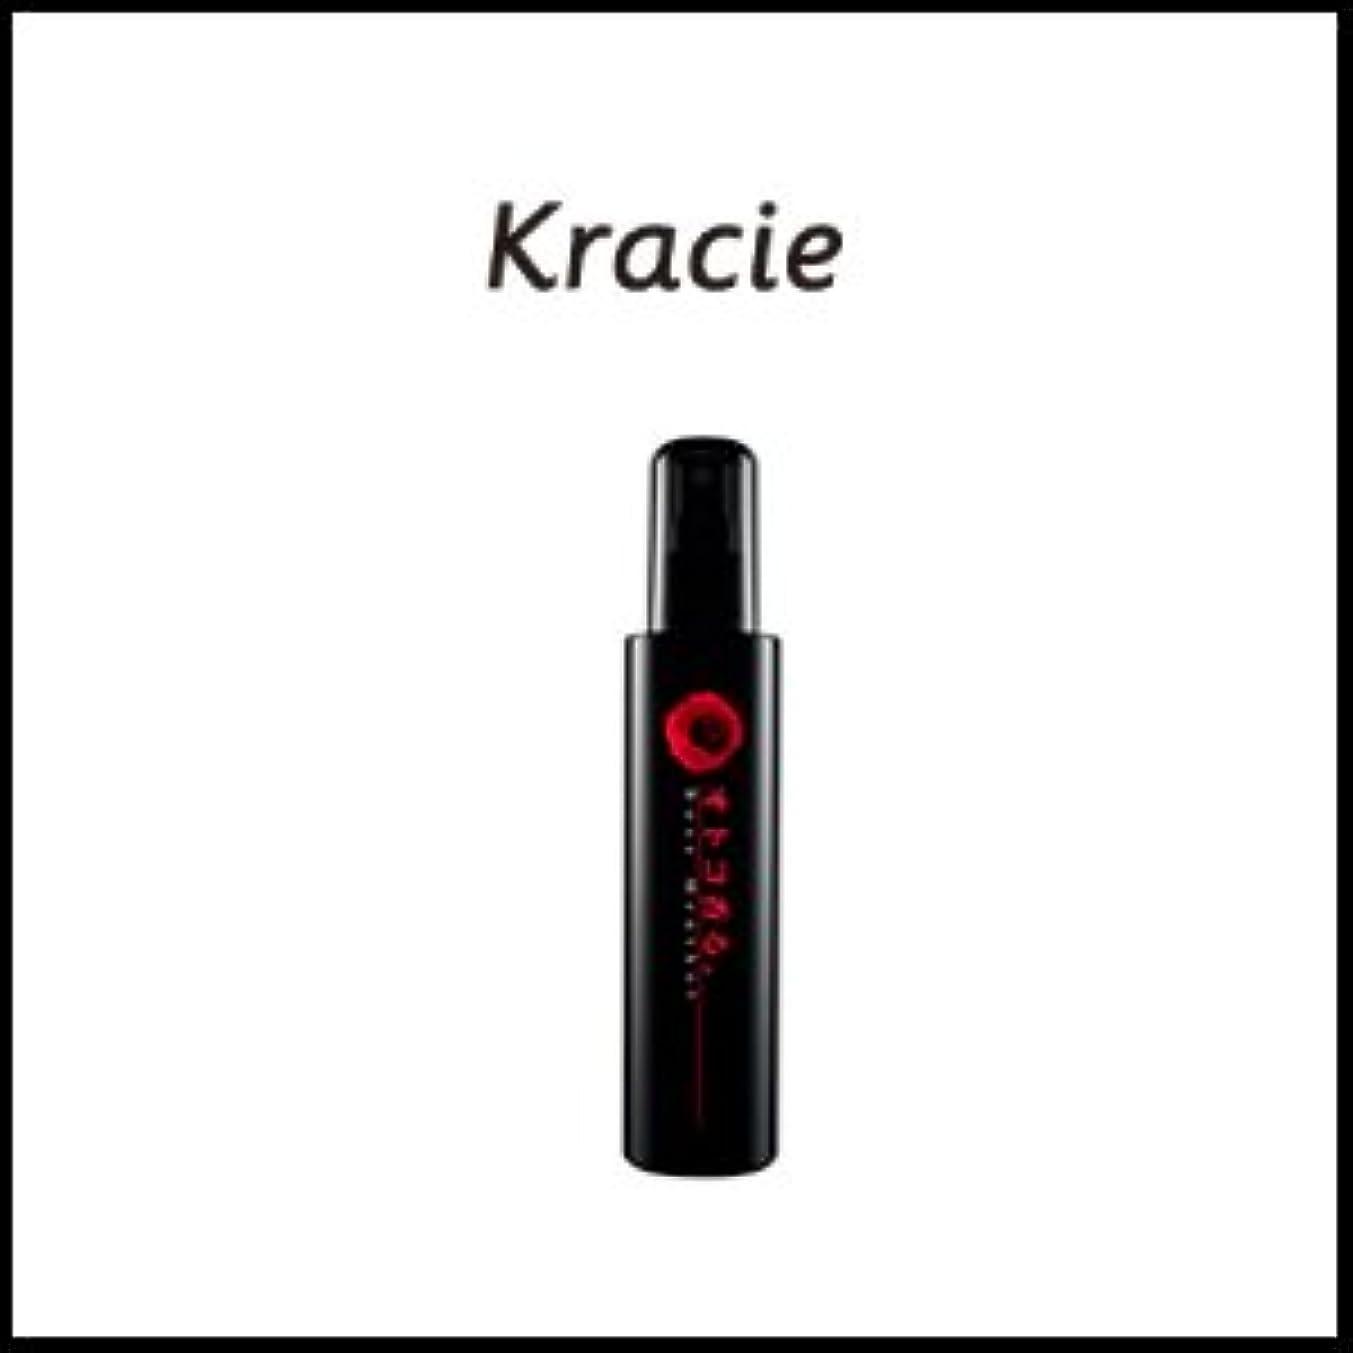 【X3個セット】 クラシエ オトコ香る トニック(レッドローズ) 150ml 容器入り